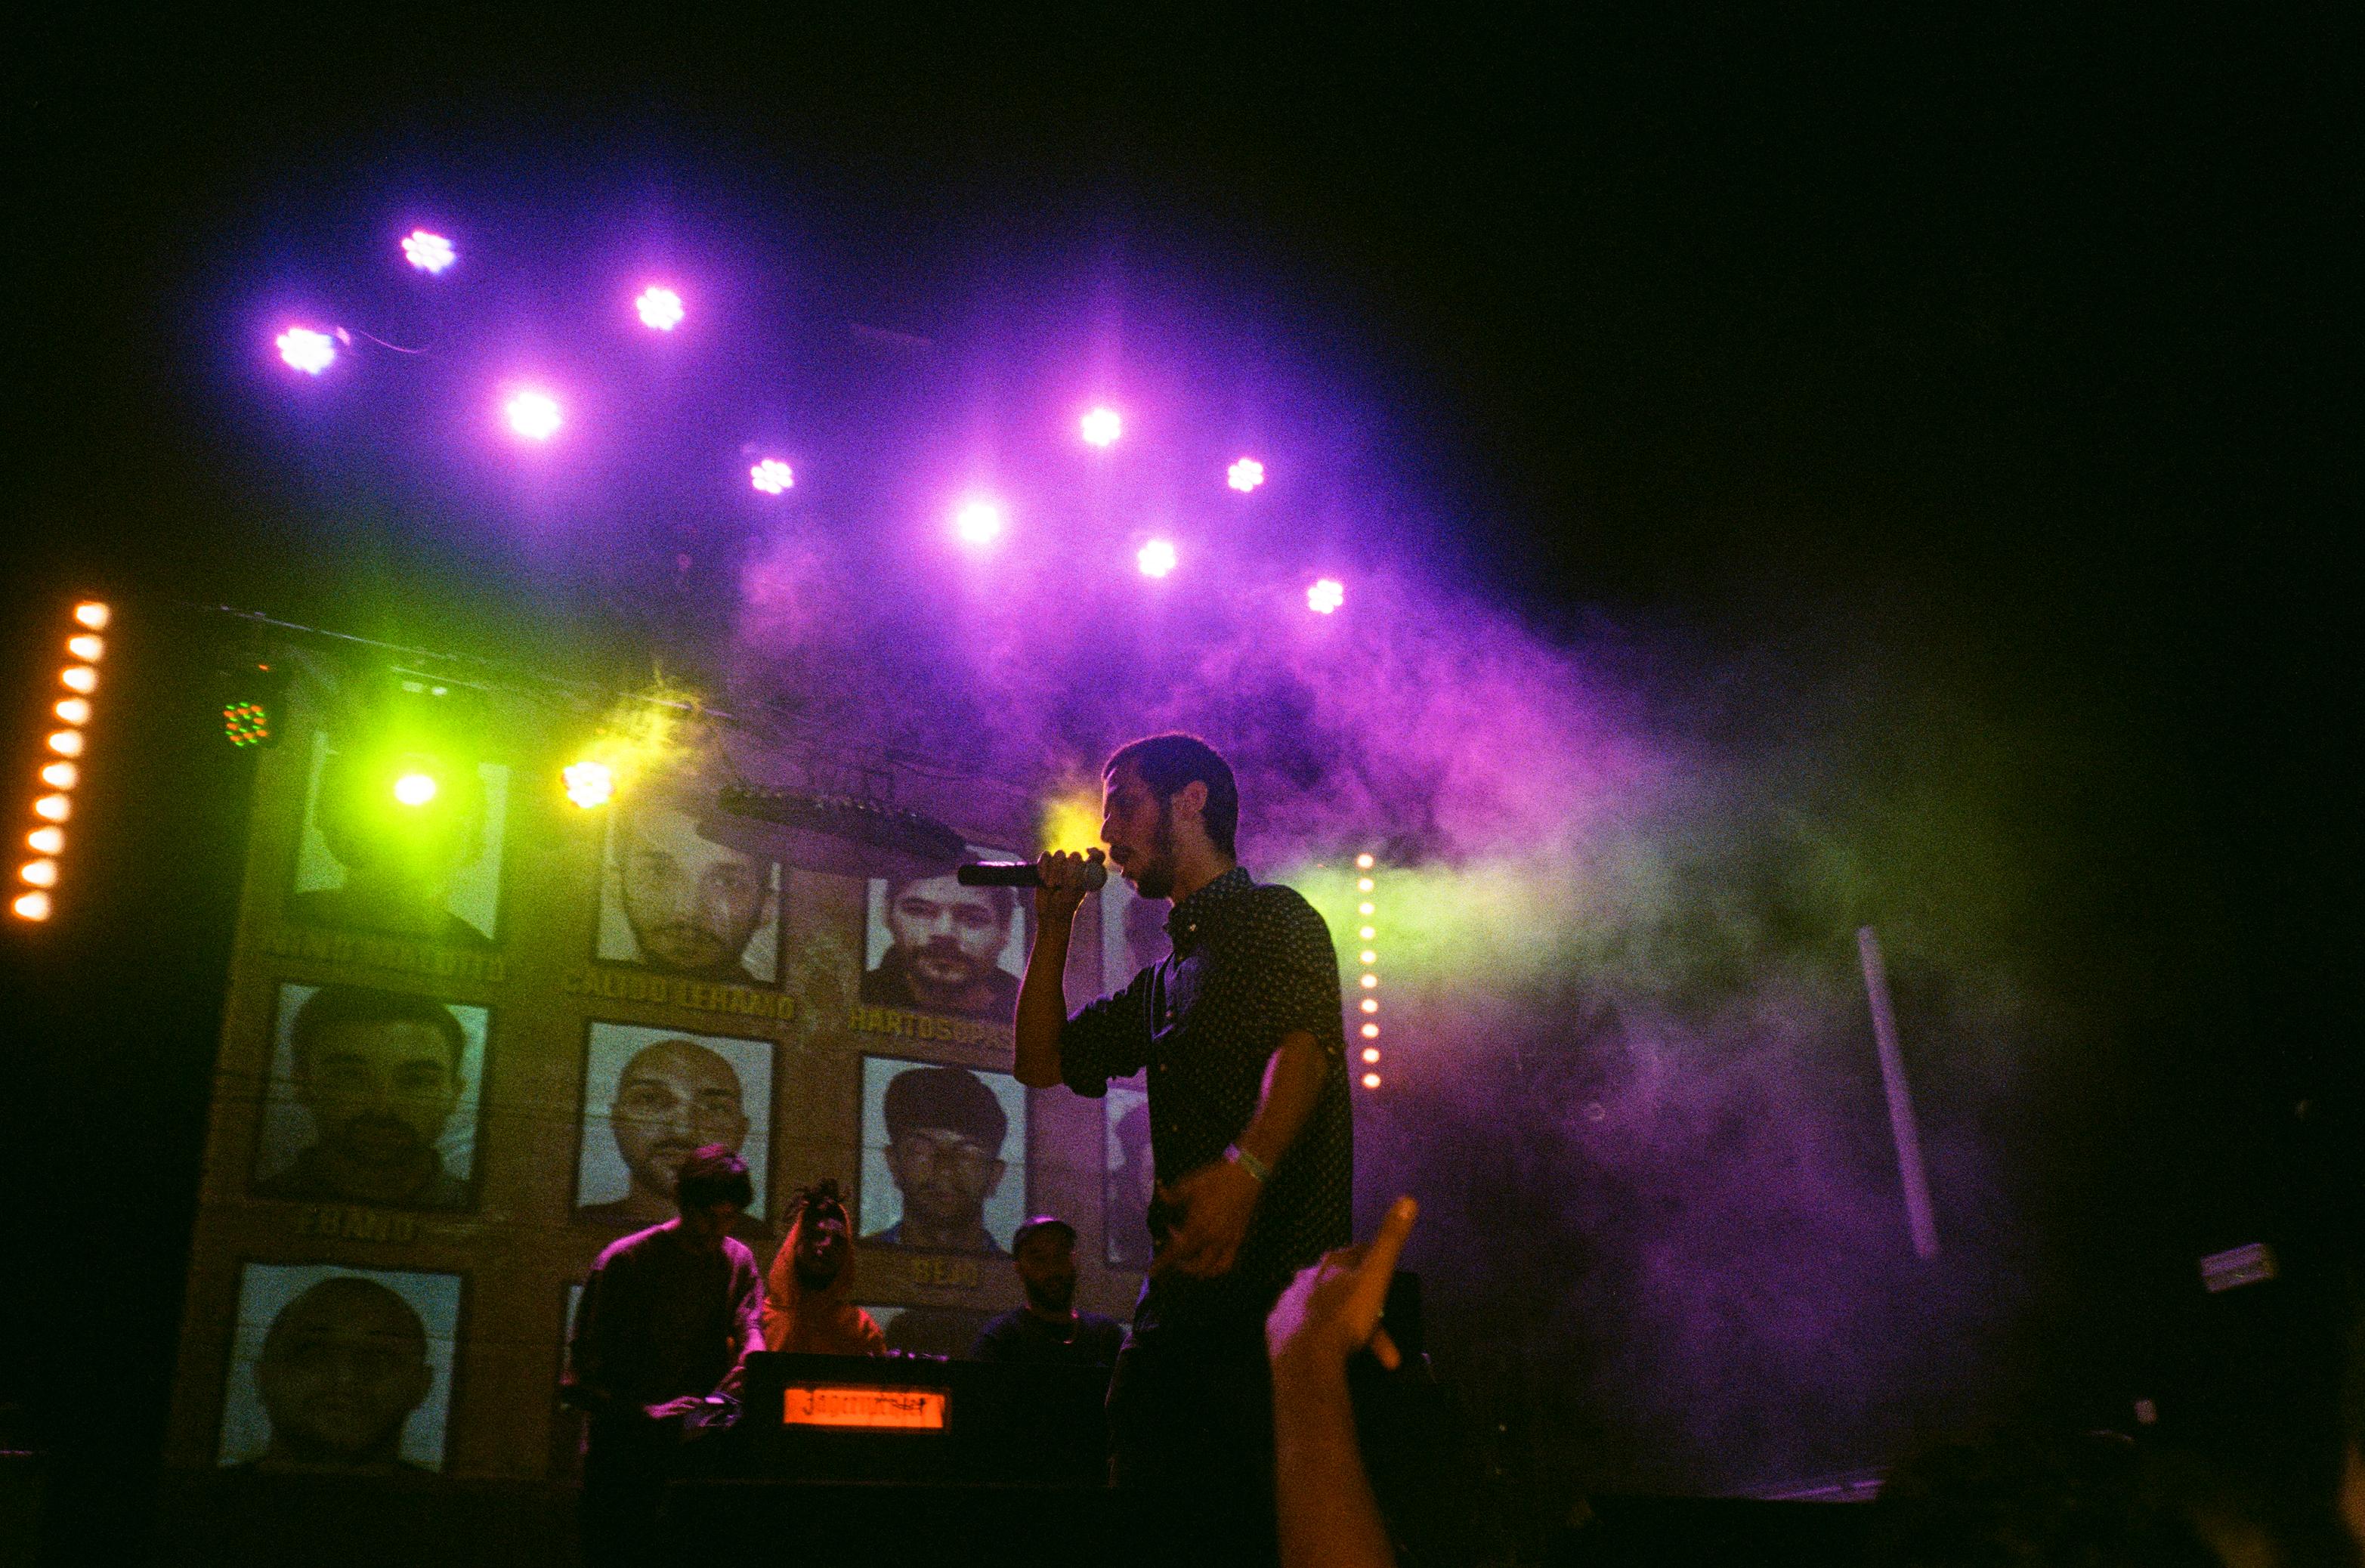 Calido Lehamo, Hartosopash, DJ Swet en I.D. Party (Fotografía por Alberto Pérez Urraca)